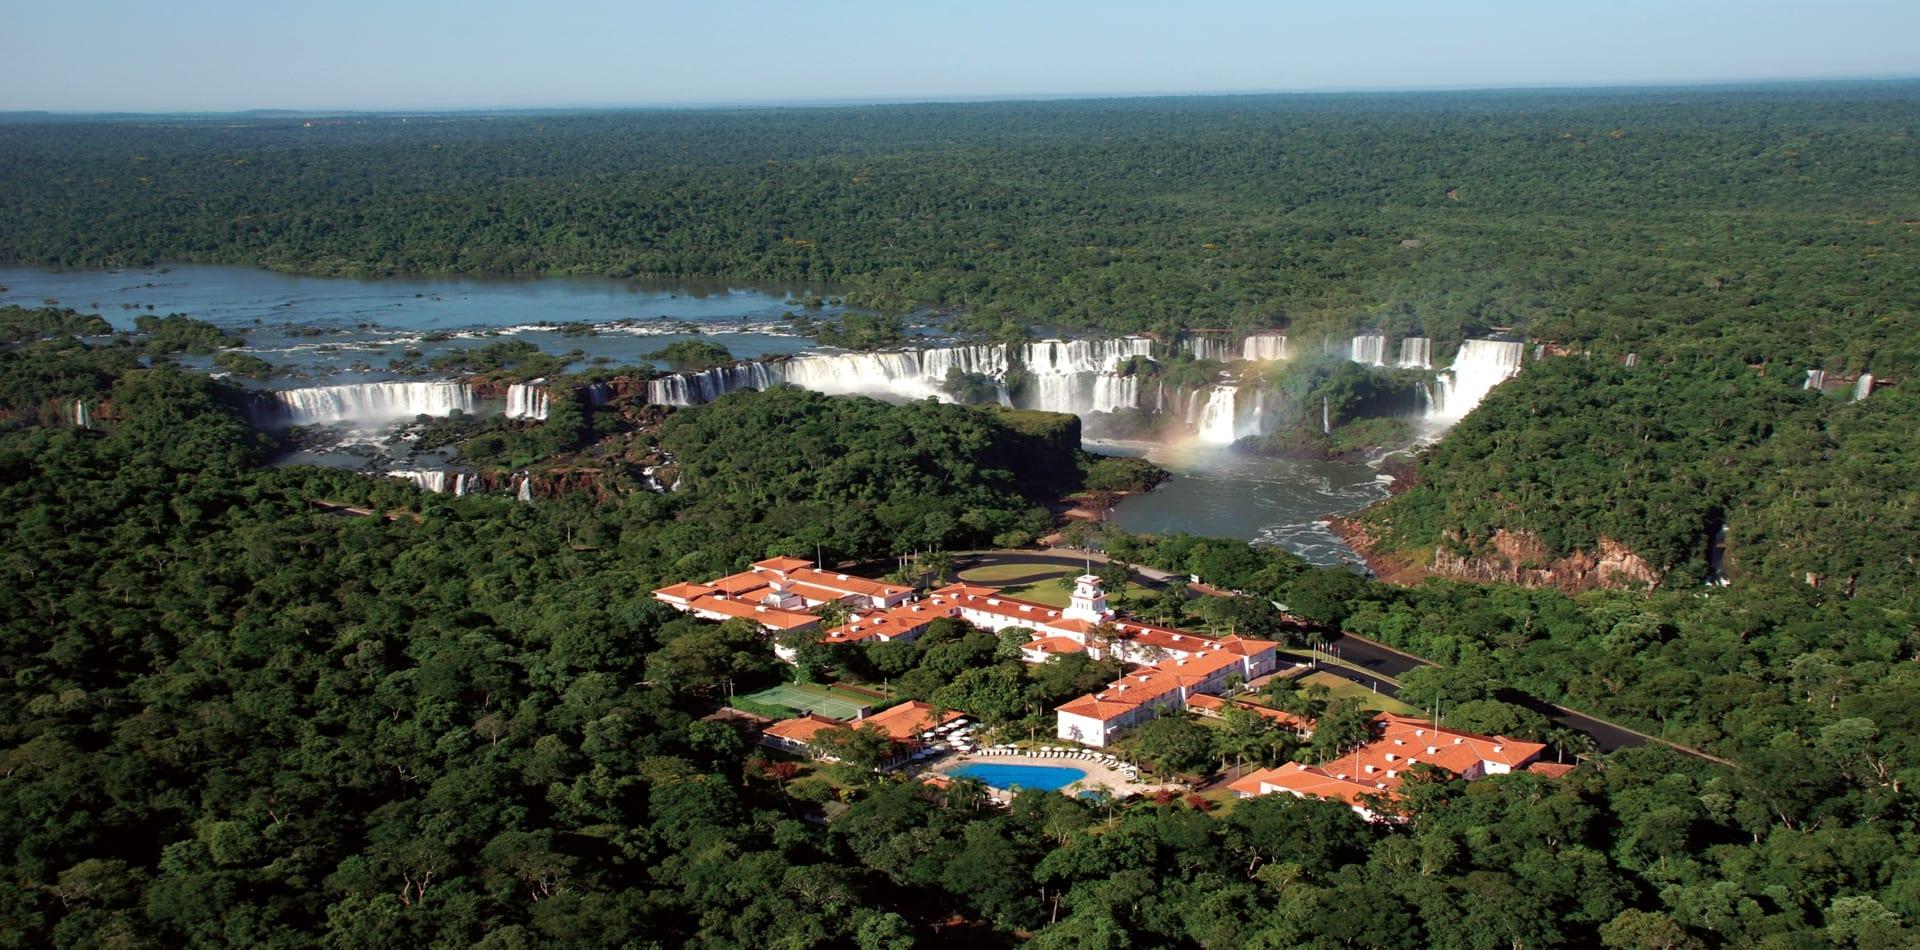 HERO Hotel Das Cataratas in front of Iguazu Falls Brazil